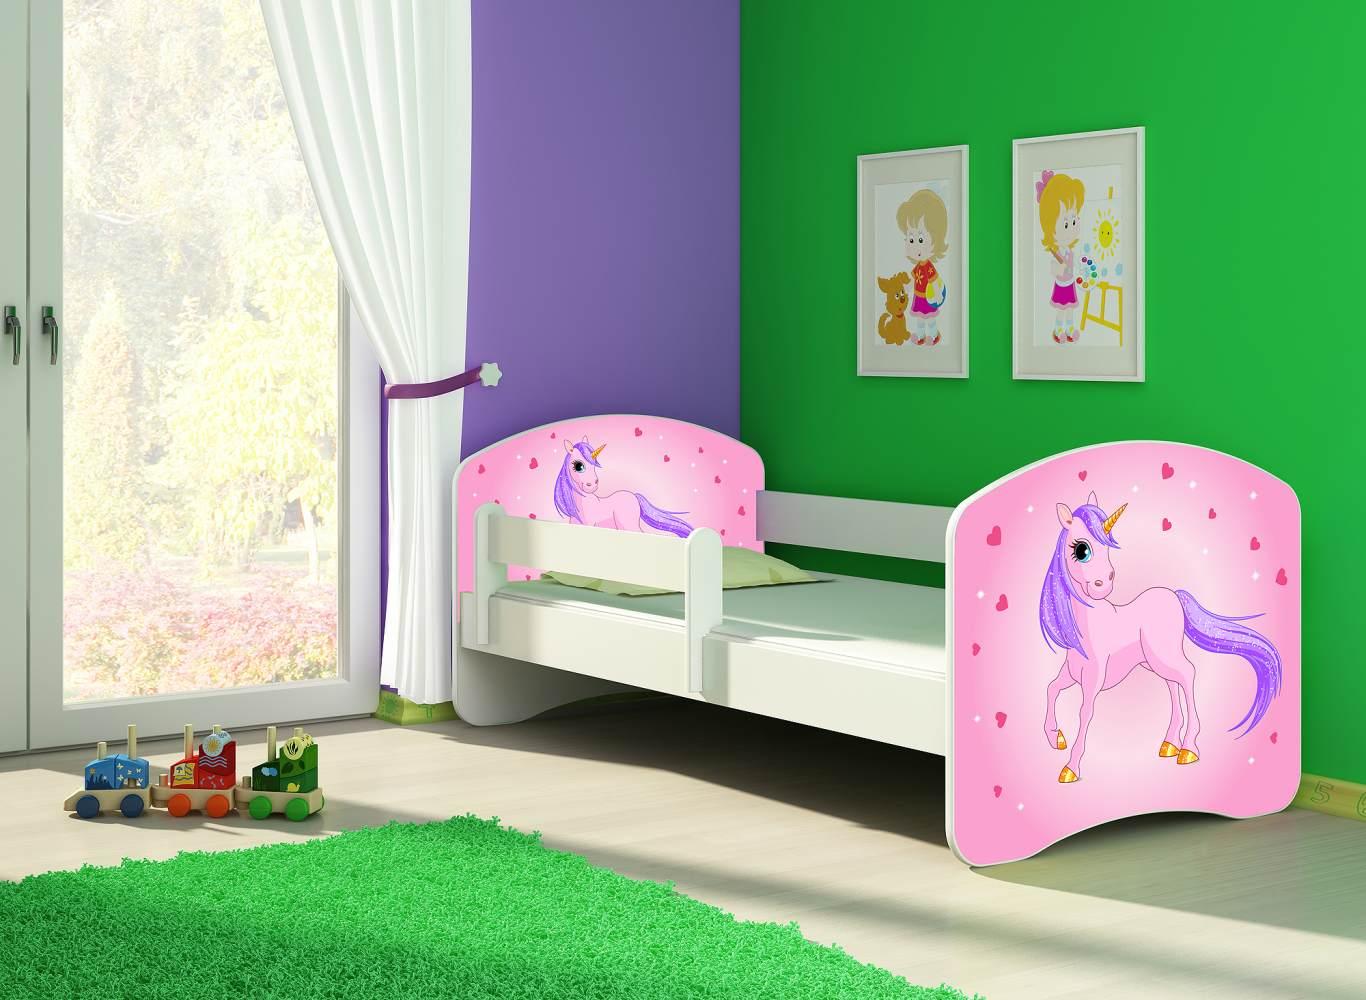 Clamaro 'Fantasia' Kinderbett 'Pony Pink' 80x 160 cm inkl. Bettkasten, Rausfallschutz, Matratze und Lattenrost Bild 1